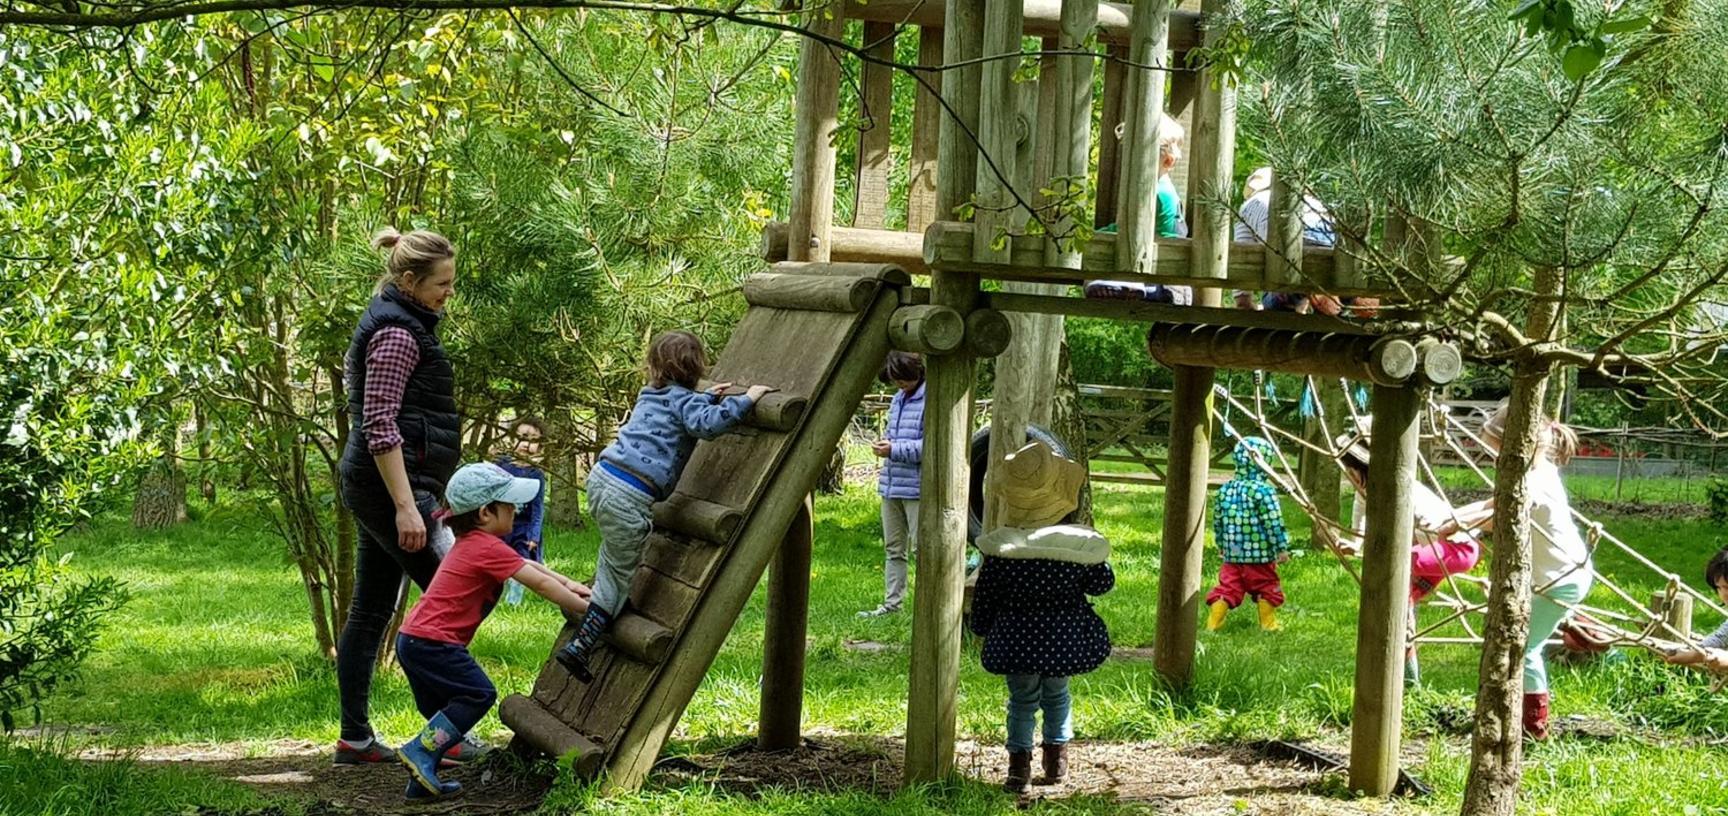 ff nursery playground